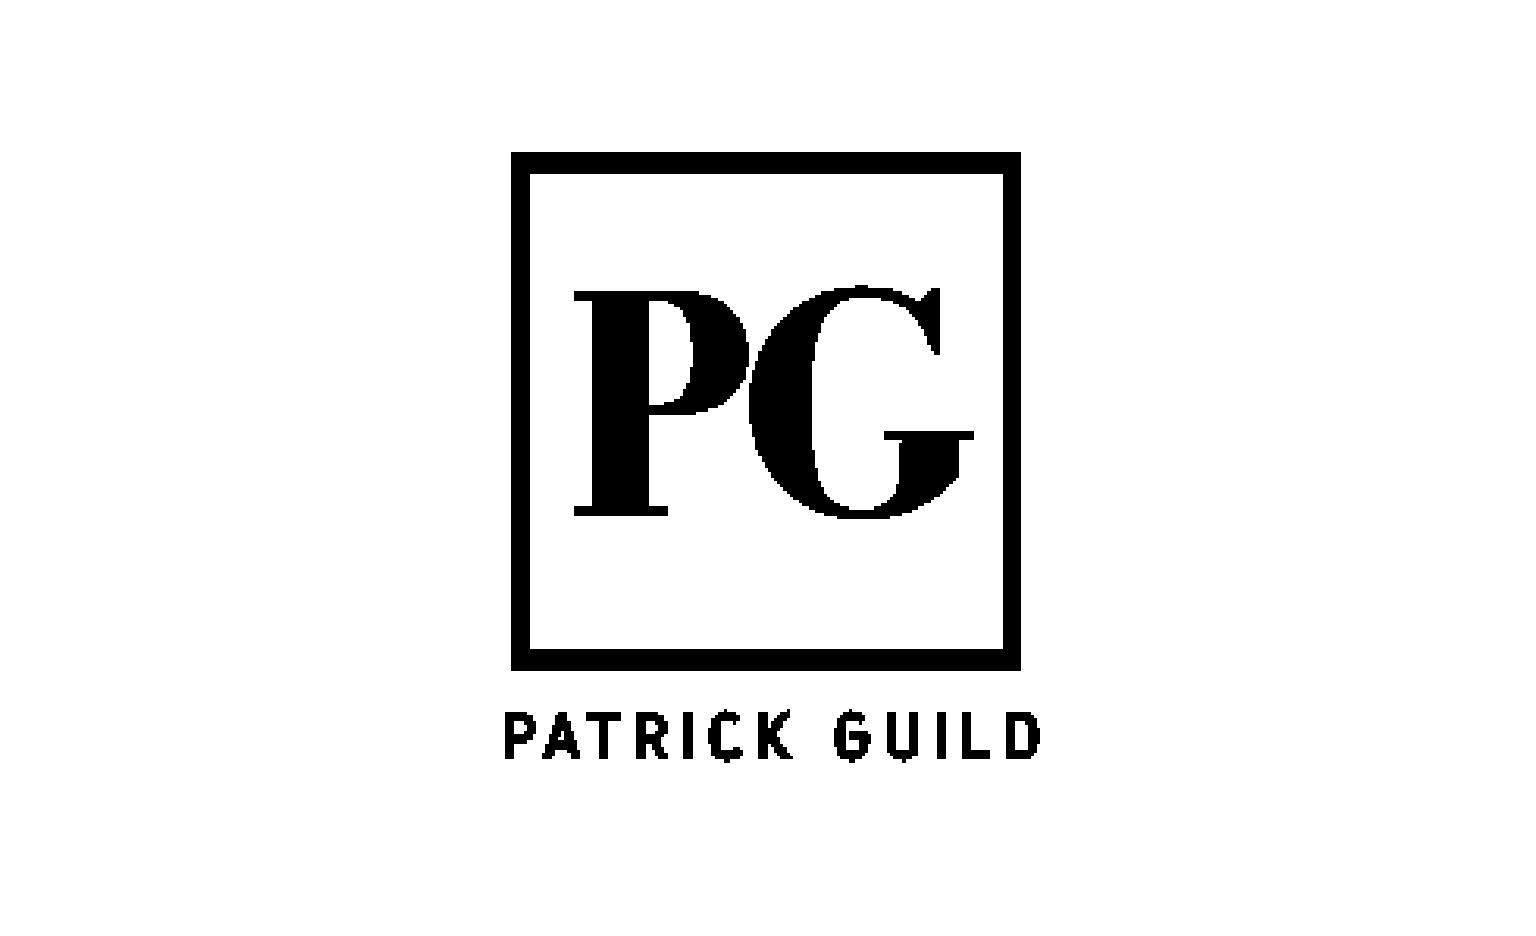 LOGO - Patrick Guild-01.png